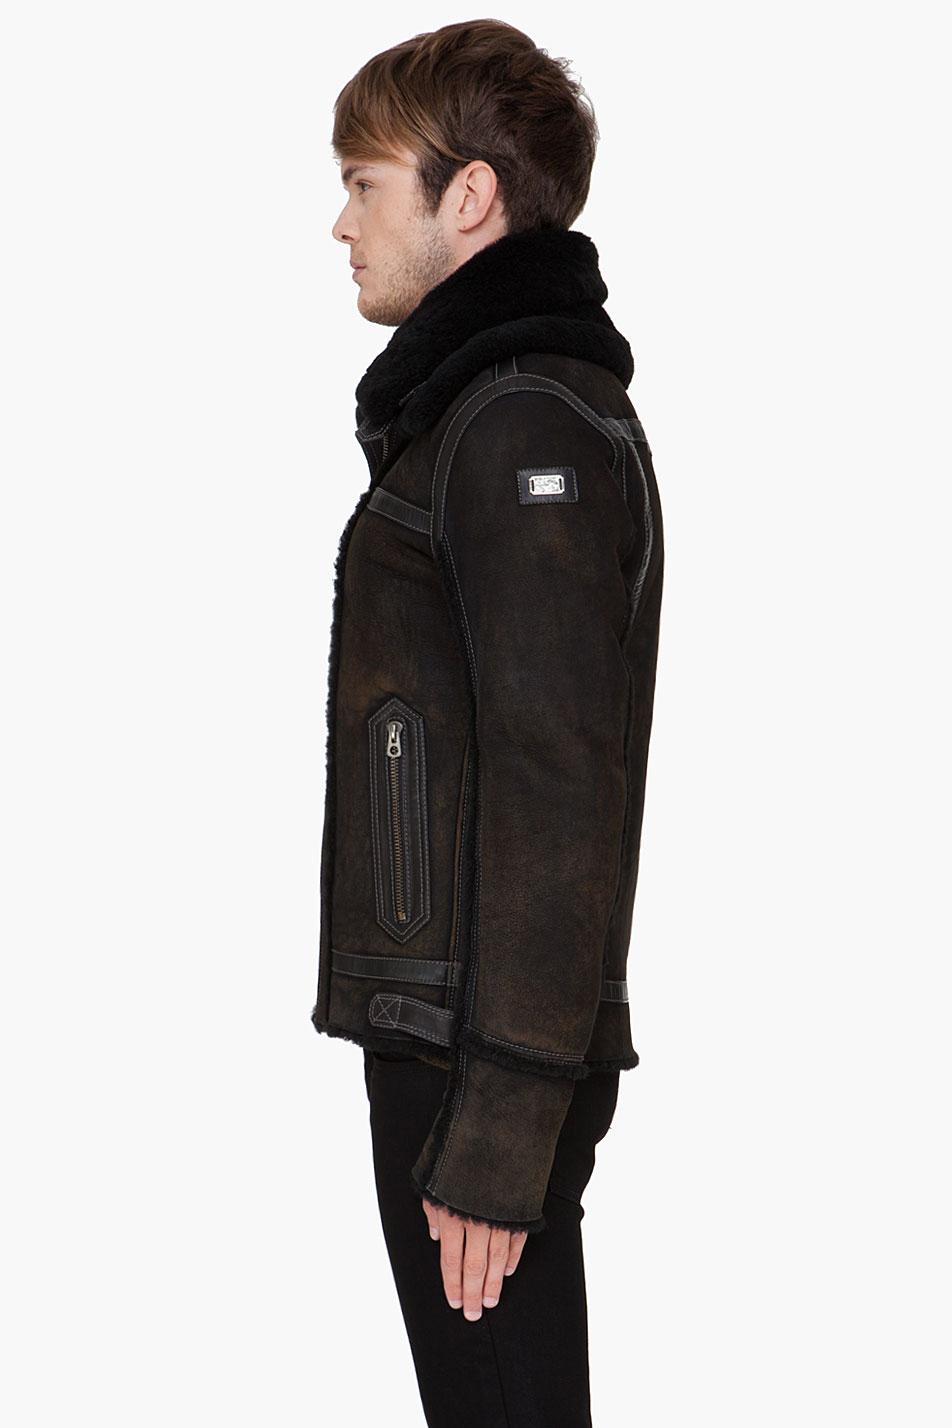 Diesel Black Shearling Lencang Jacket In Black For Men Lyst